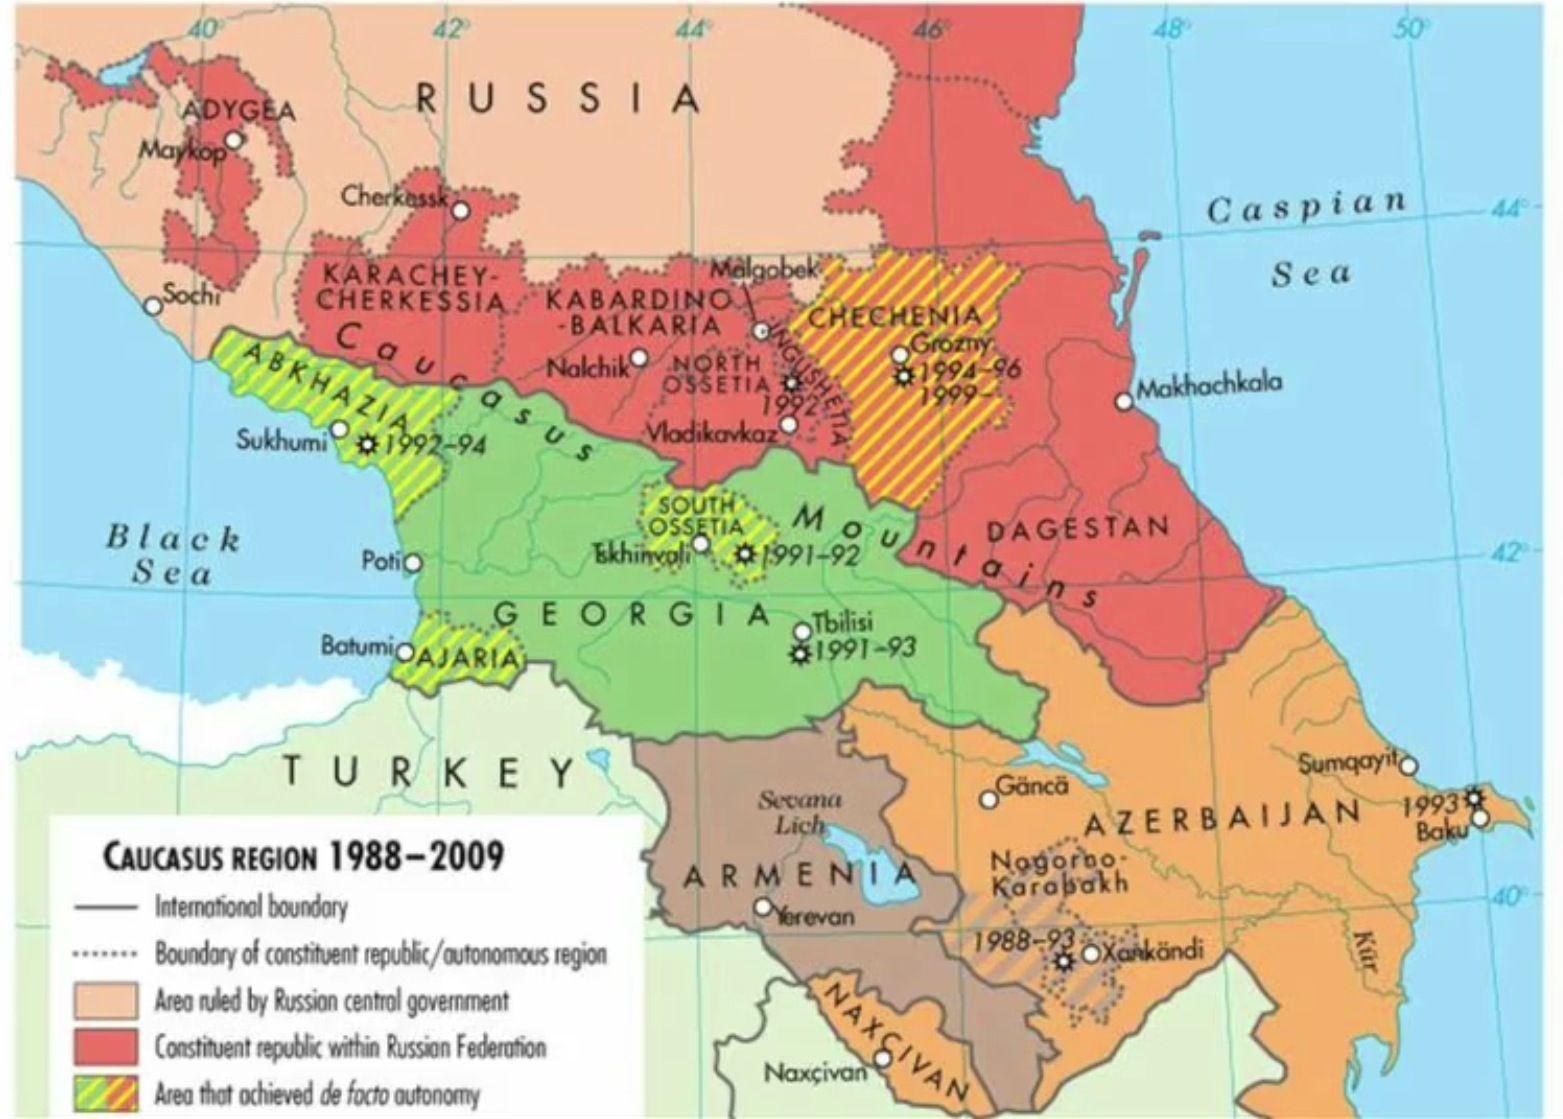 Caucasus region 2009   Historical maps, Modern history, History